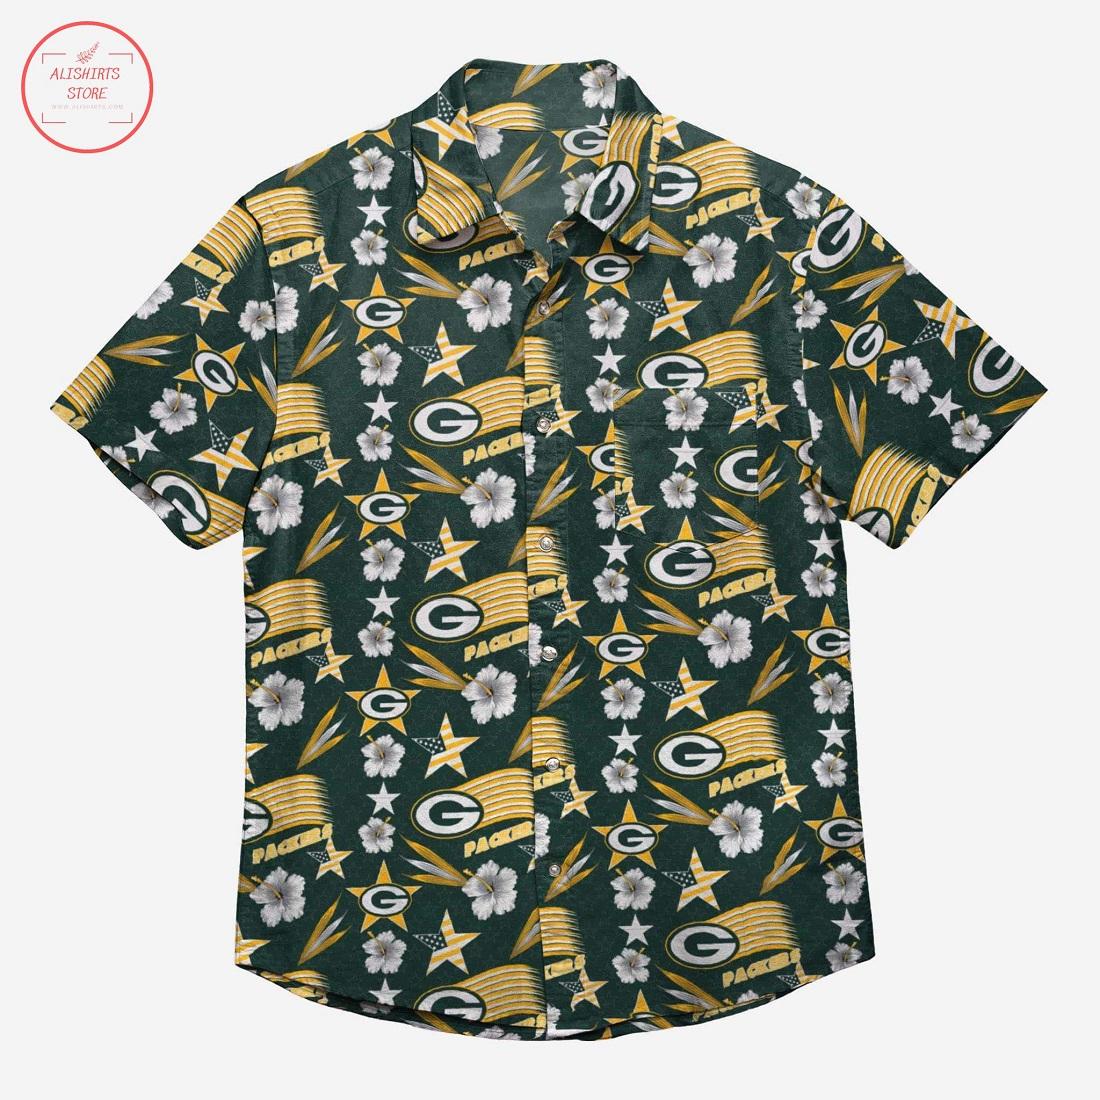 Green Bay Packers Americana Hawaiian Shirt